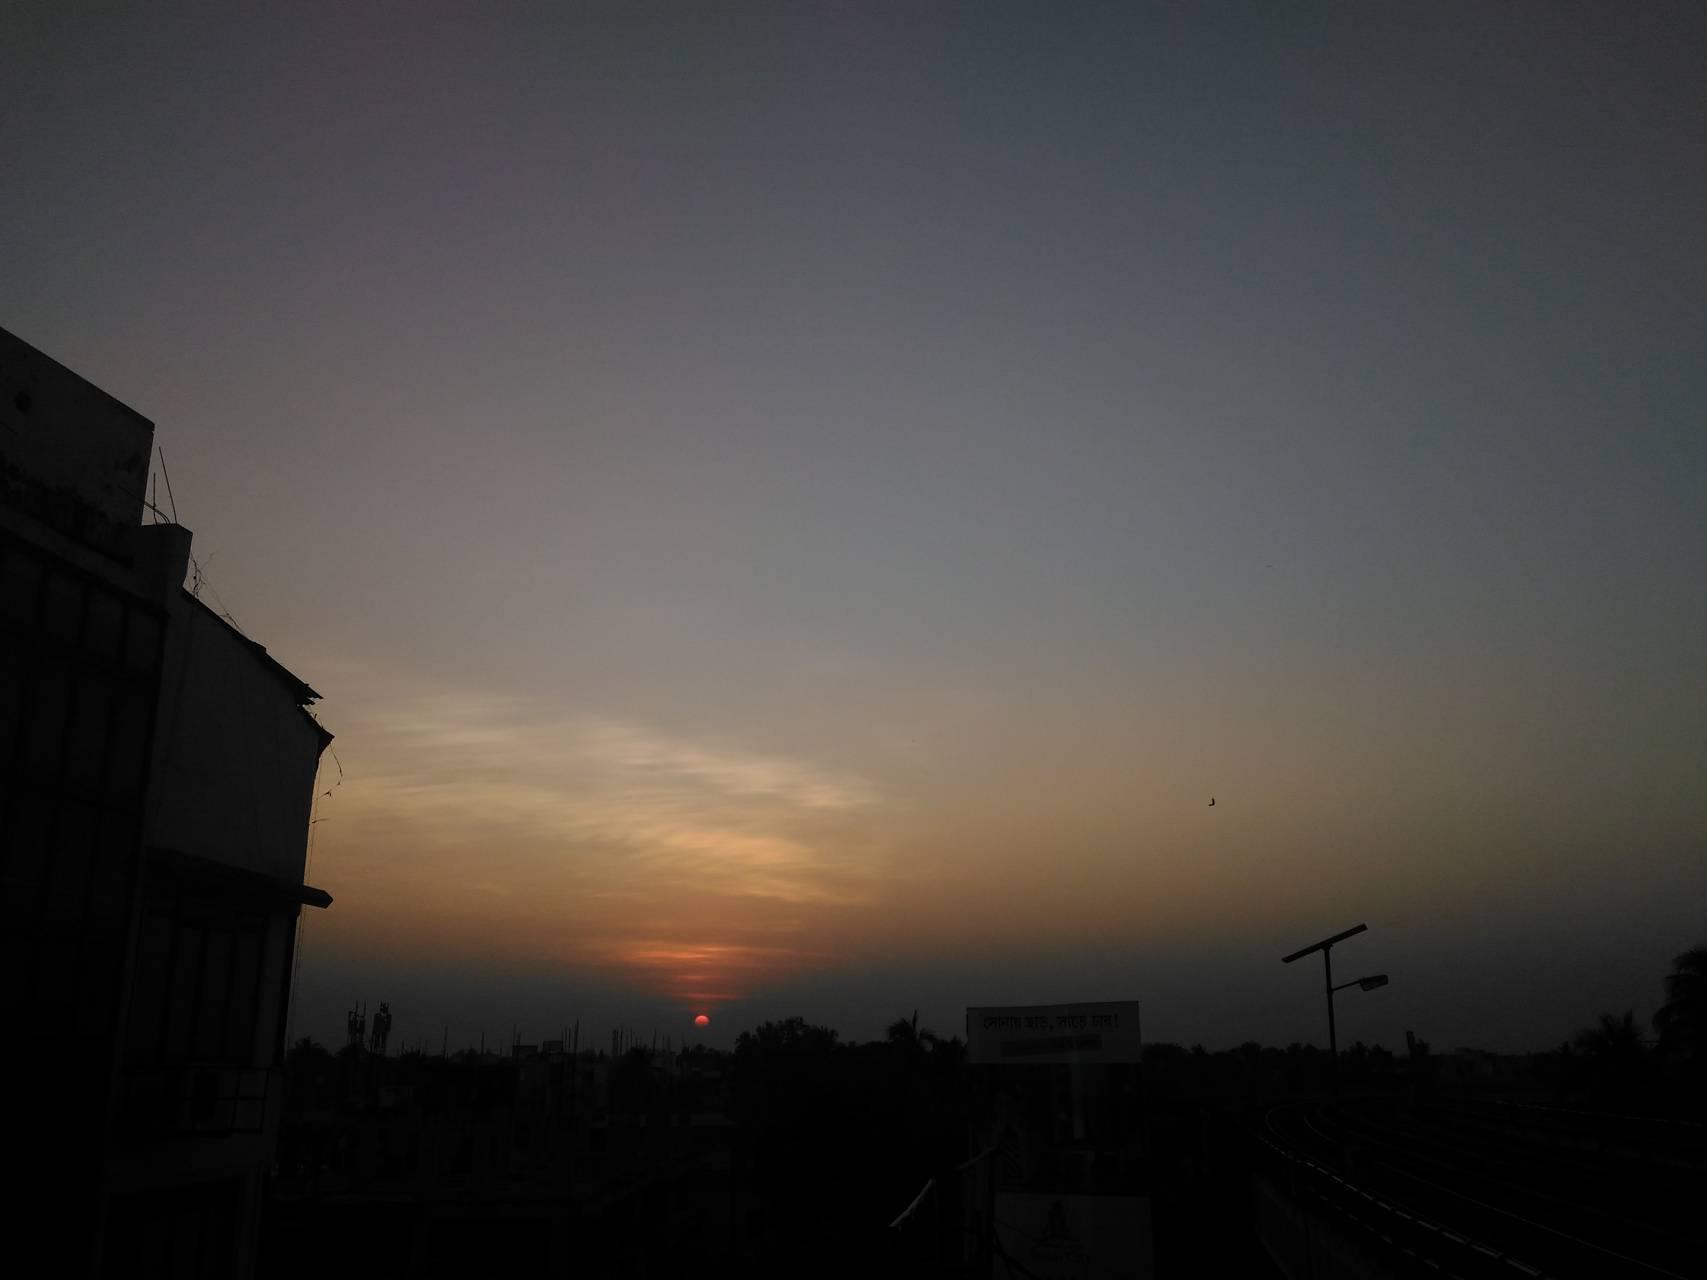 Evening last light